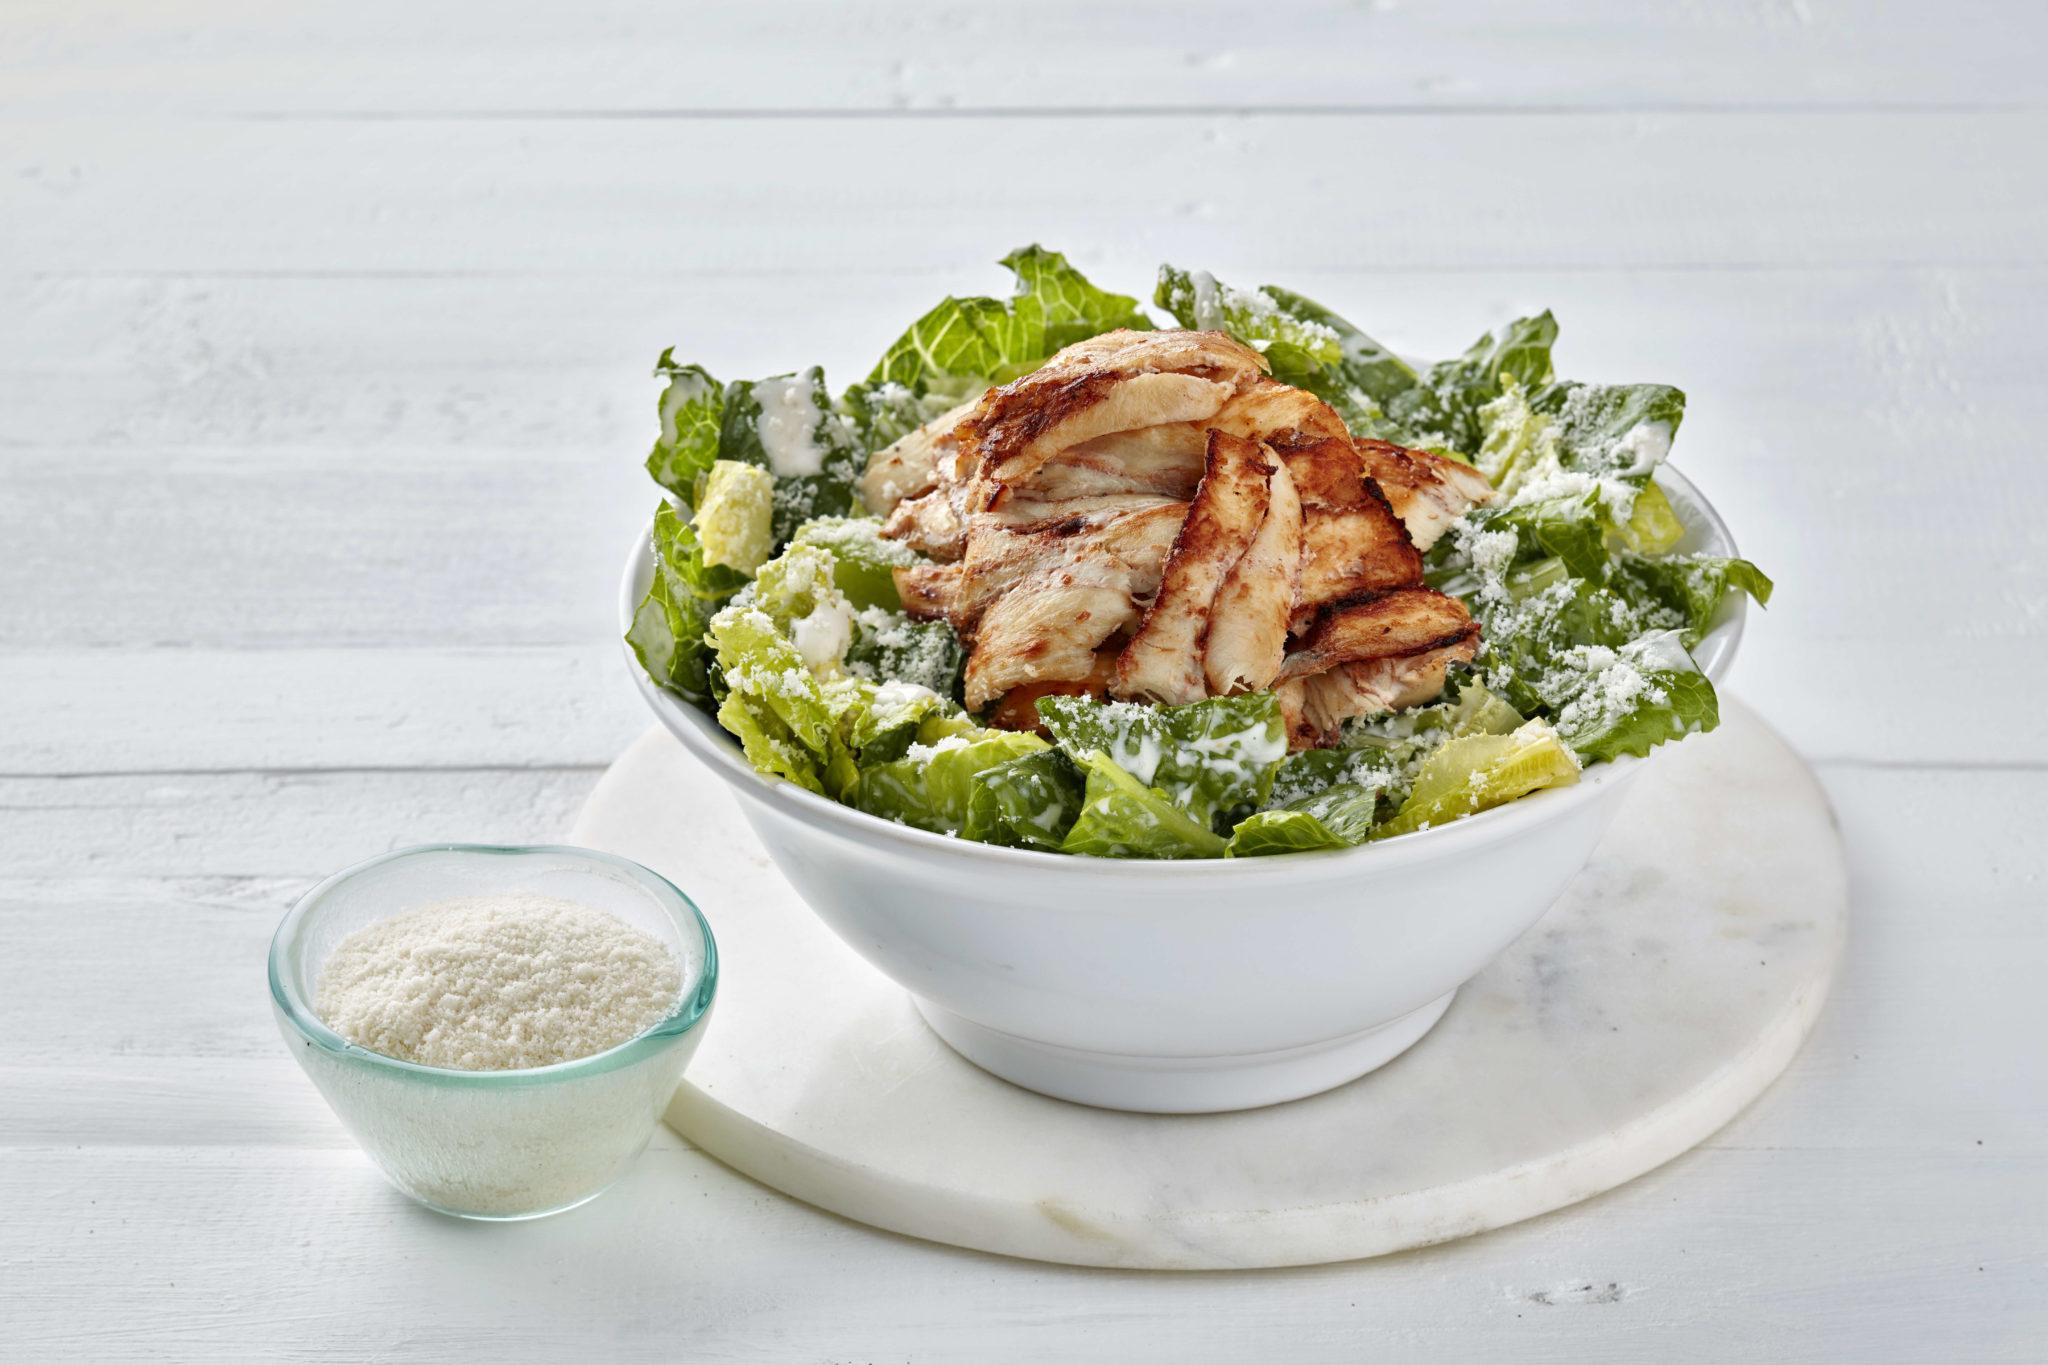 Upfit gesunder Caesar Salad